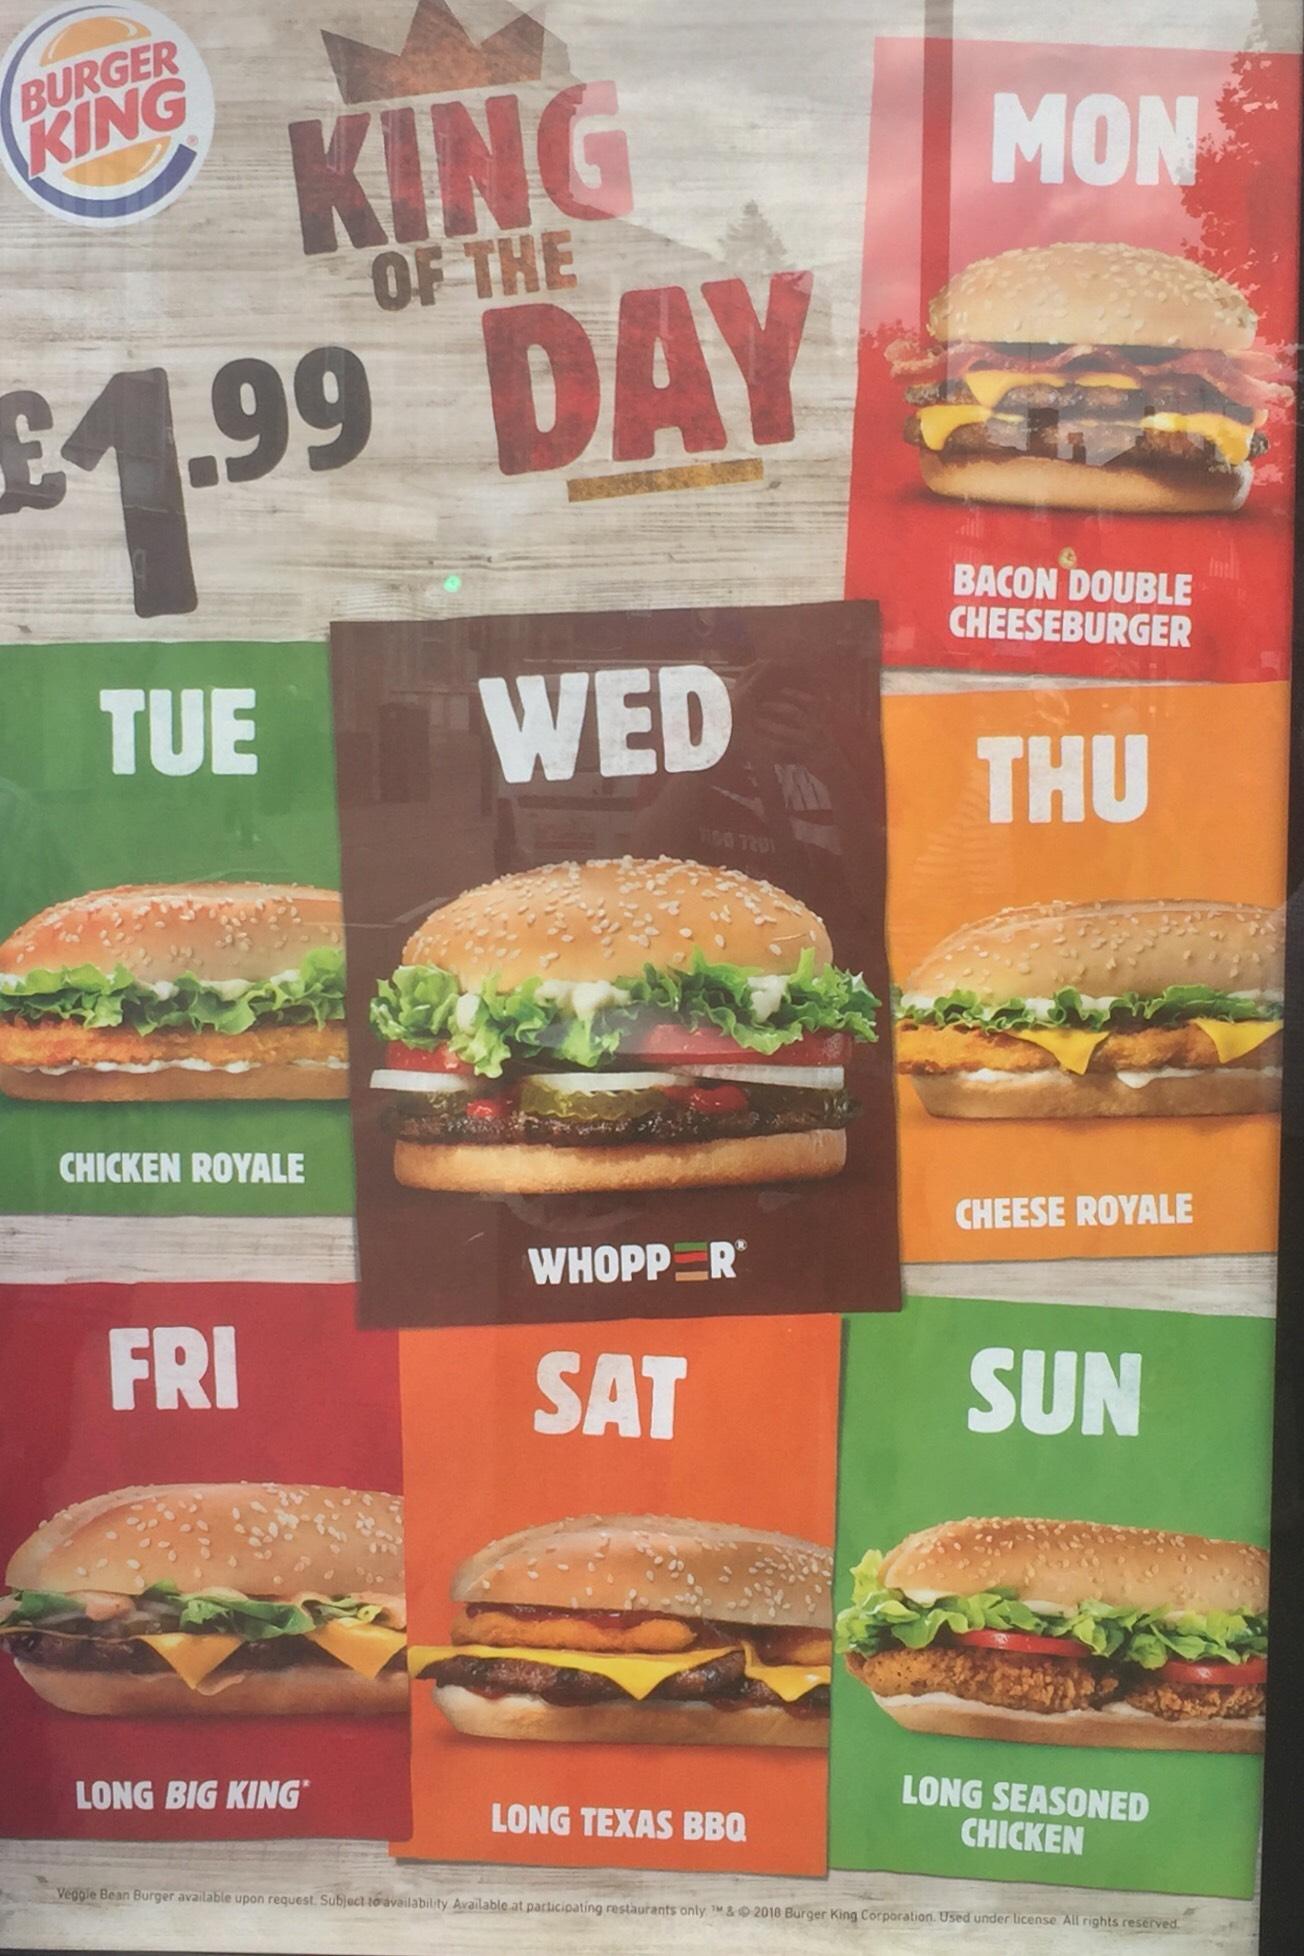 £1.99 King Of The Day at Burger King